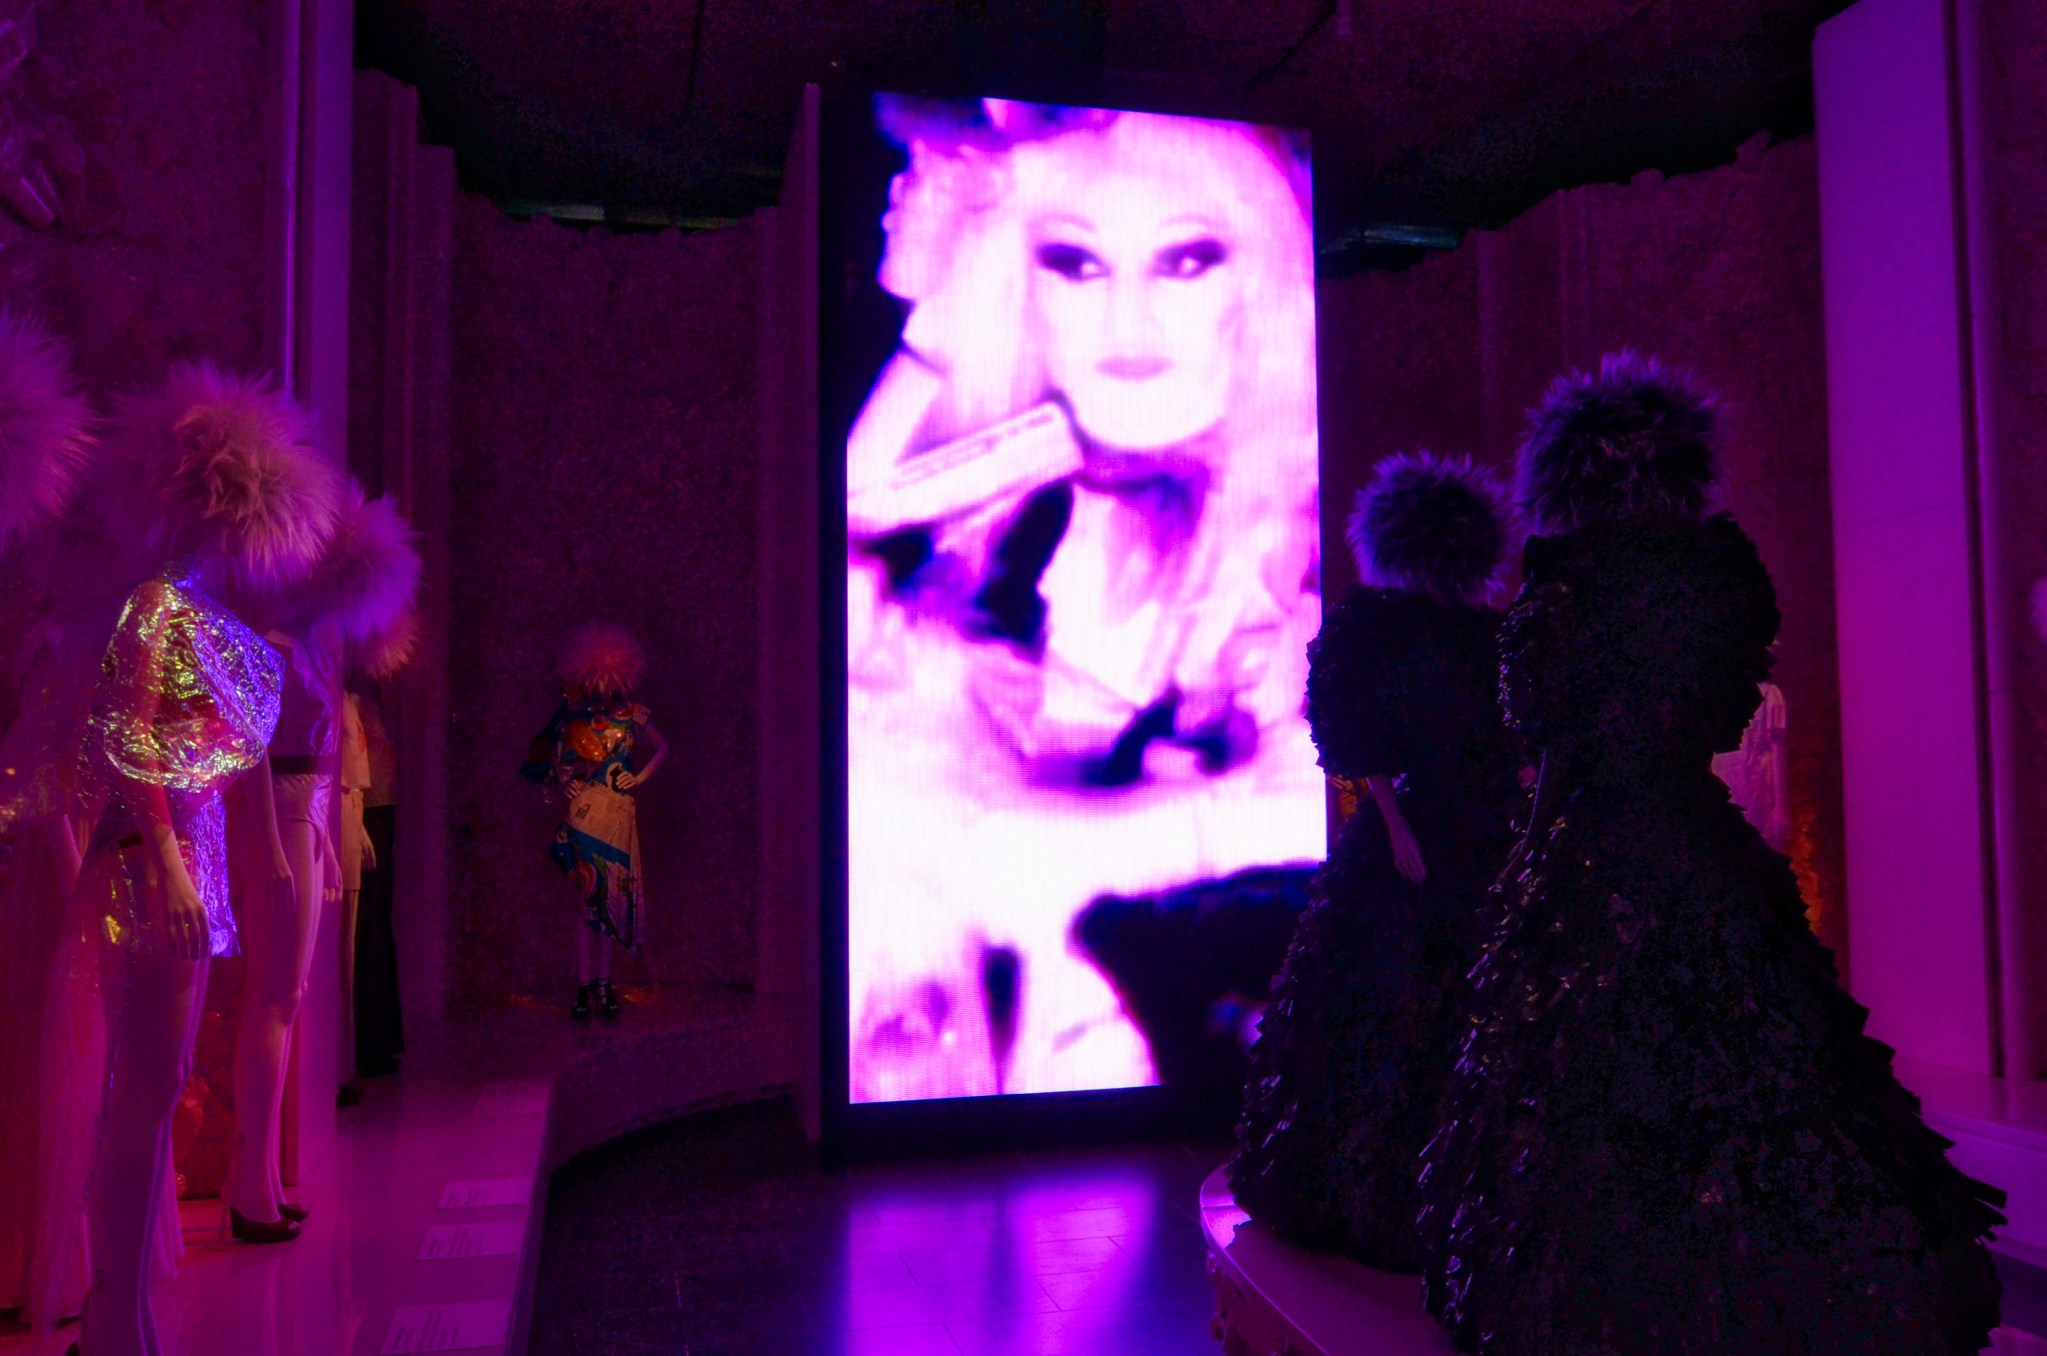 Met_Museum_Punk_Bricolage_LED_Wall_